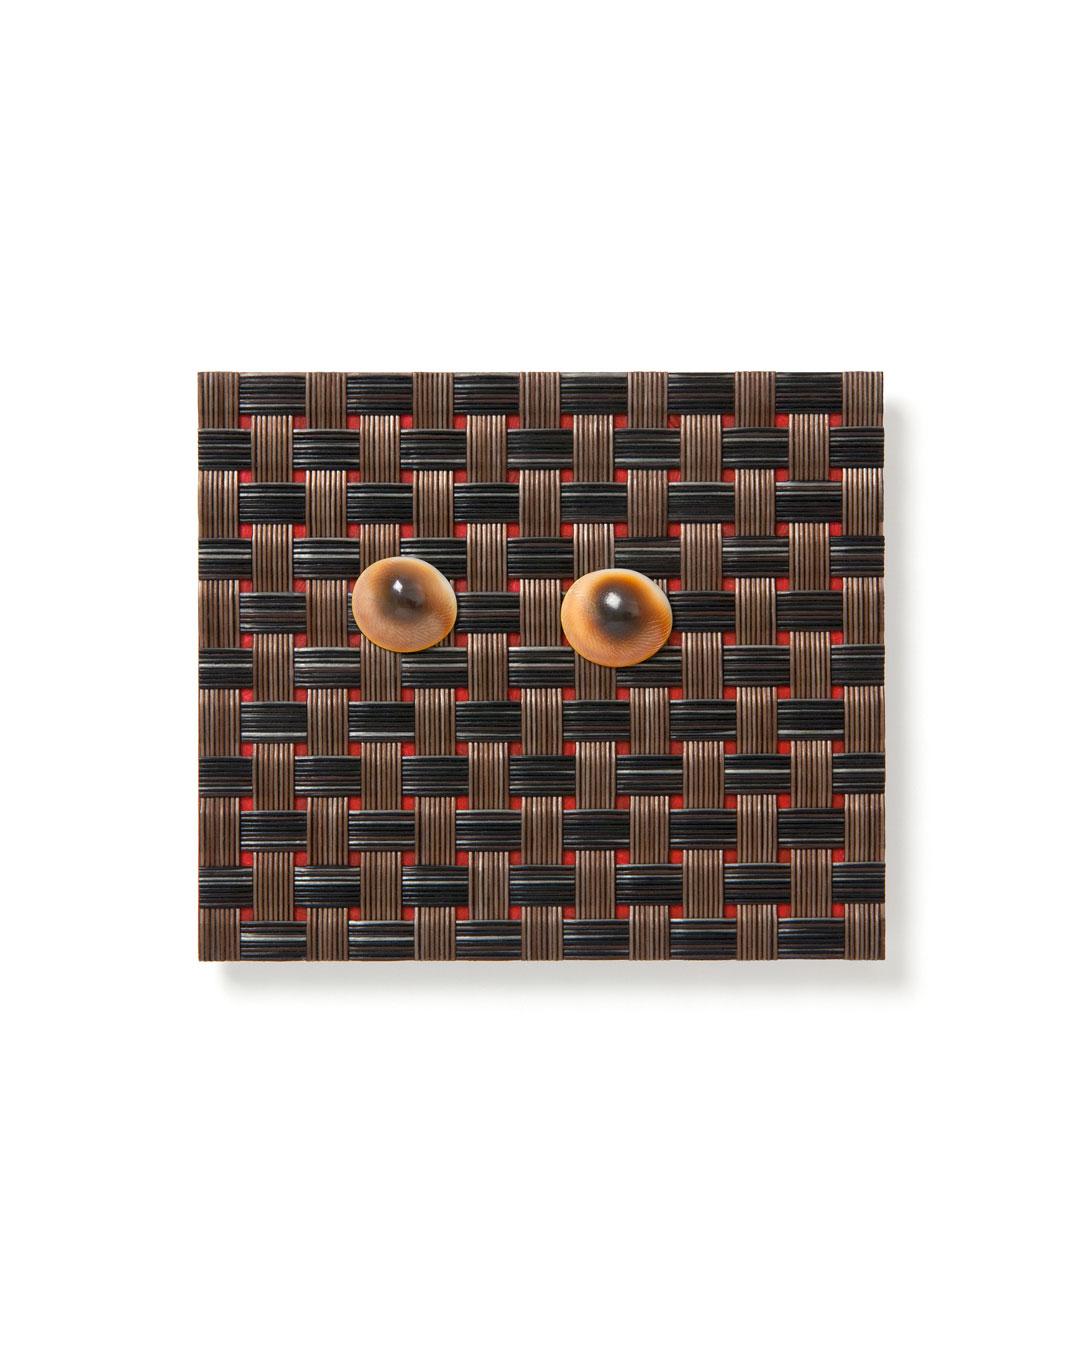 Otto Künzli, Quidam XVIII, 2019, brooch; Corian, plastic, operculum, acrylic paint, steel, 75 x 87 mm, €3900